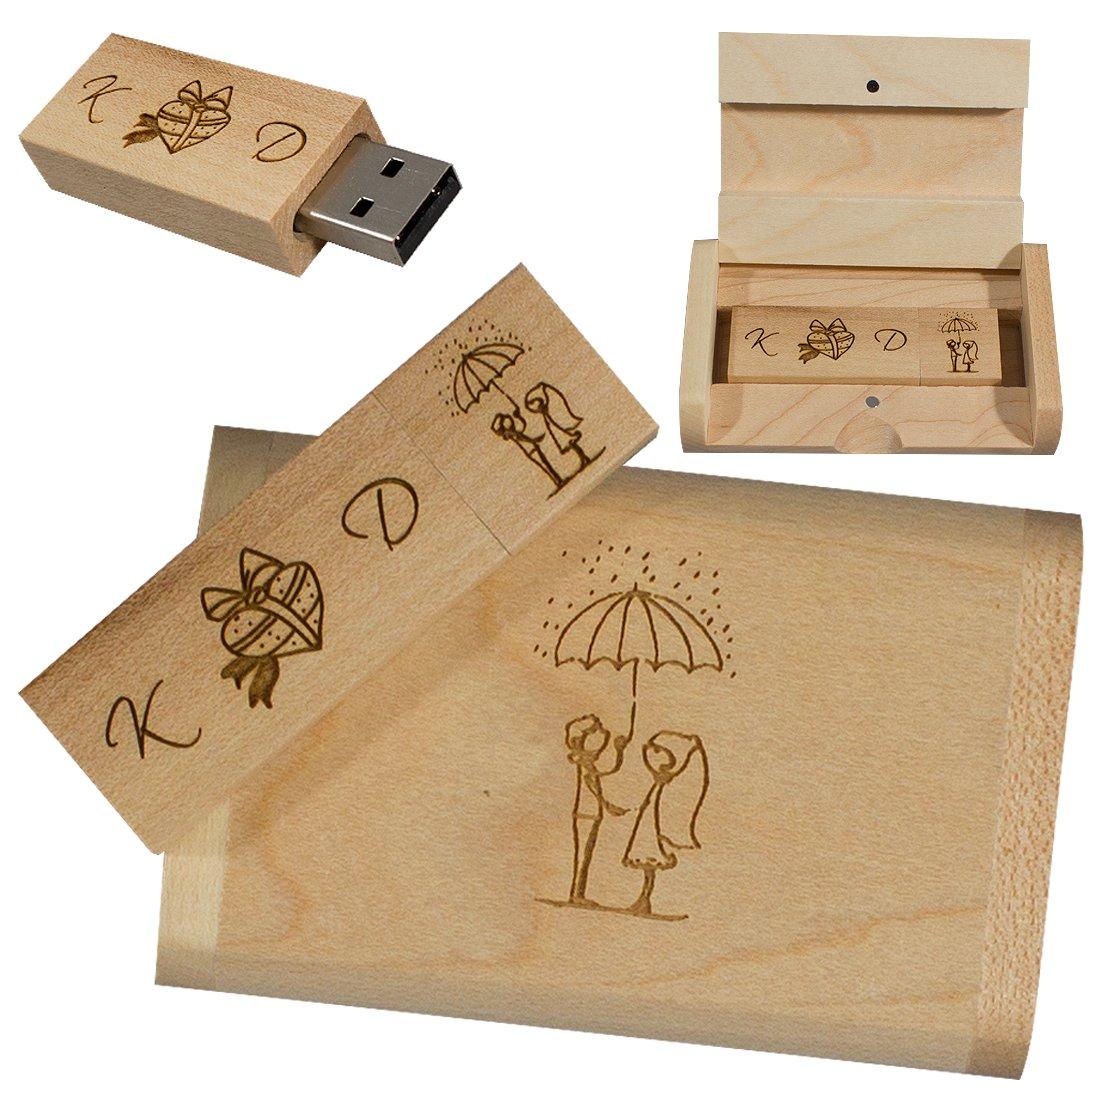 Memoria flash en caja de madera ecológica